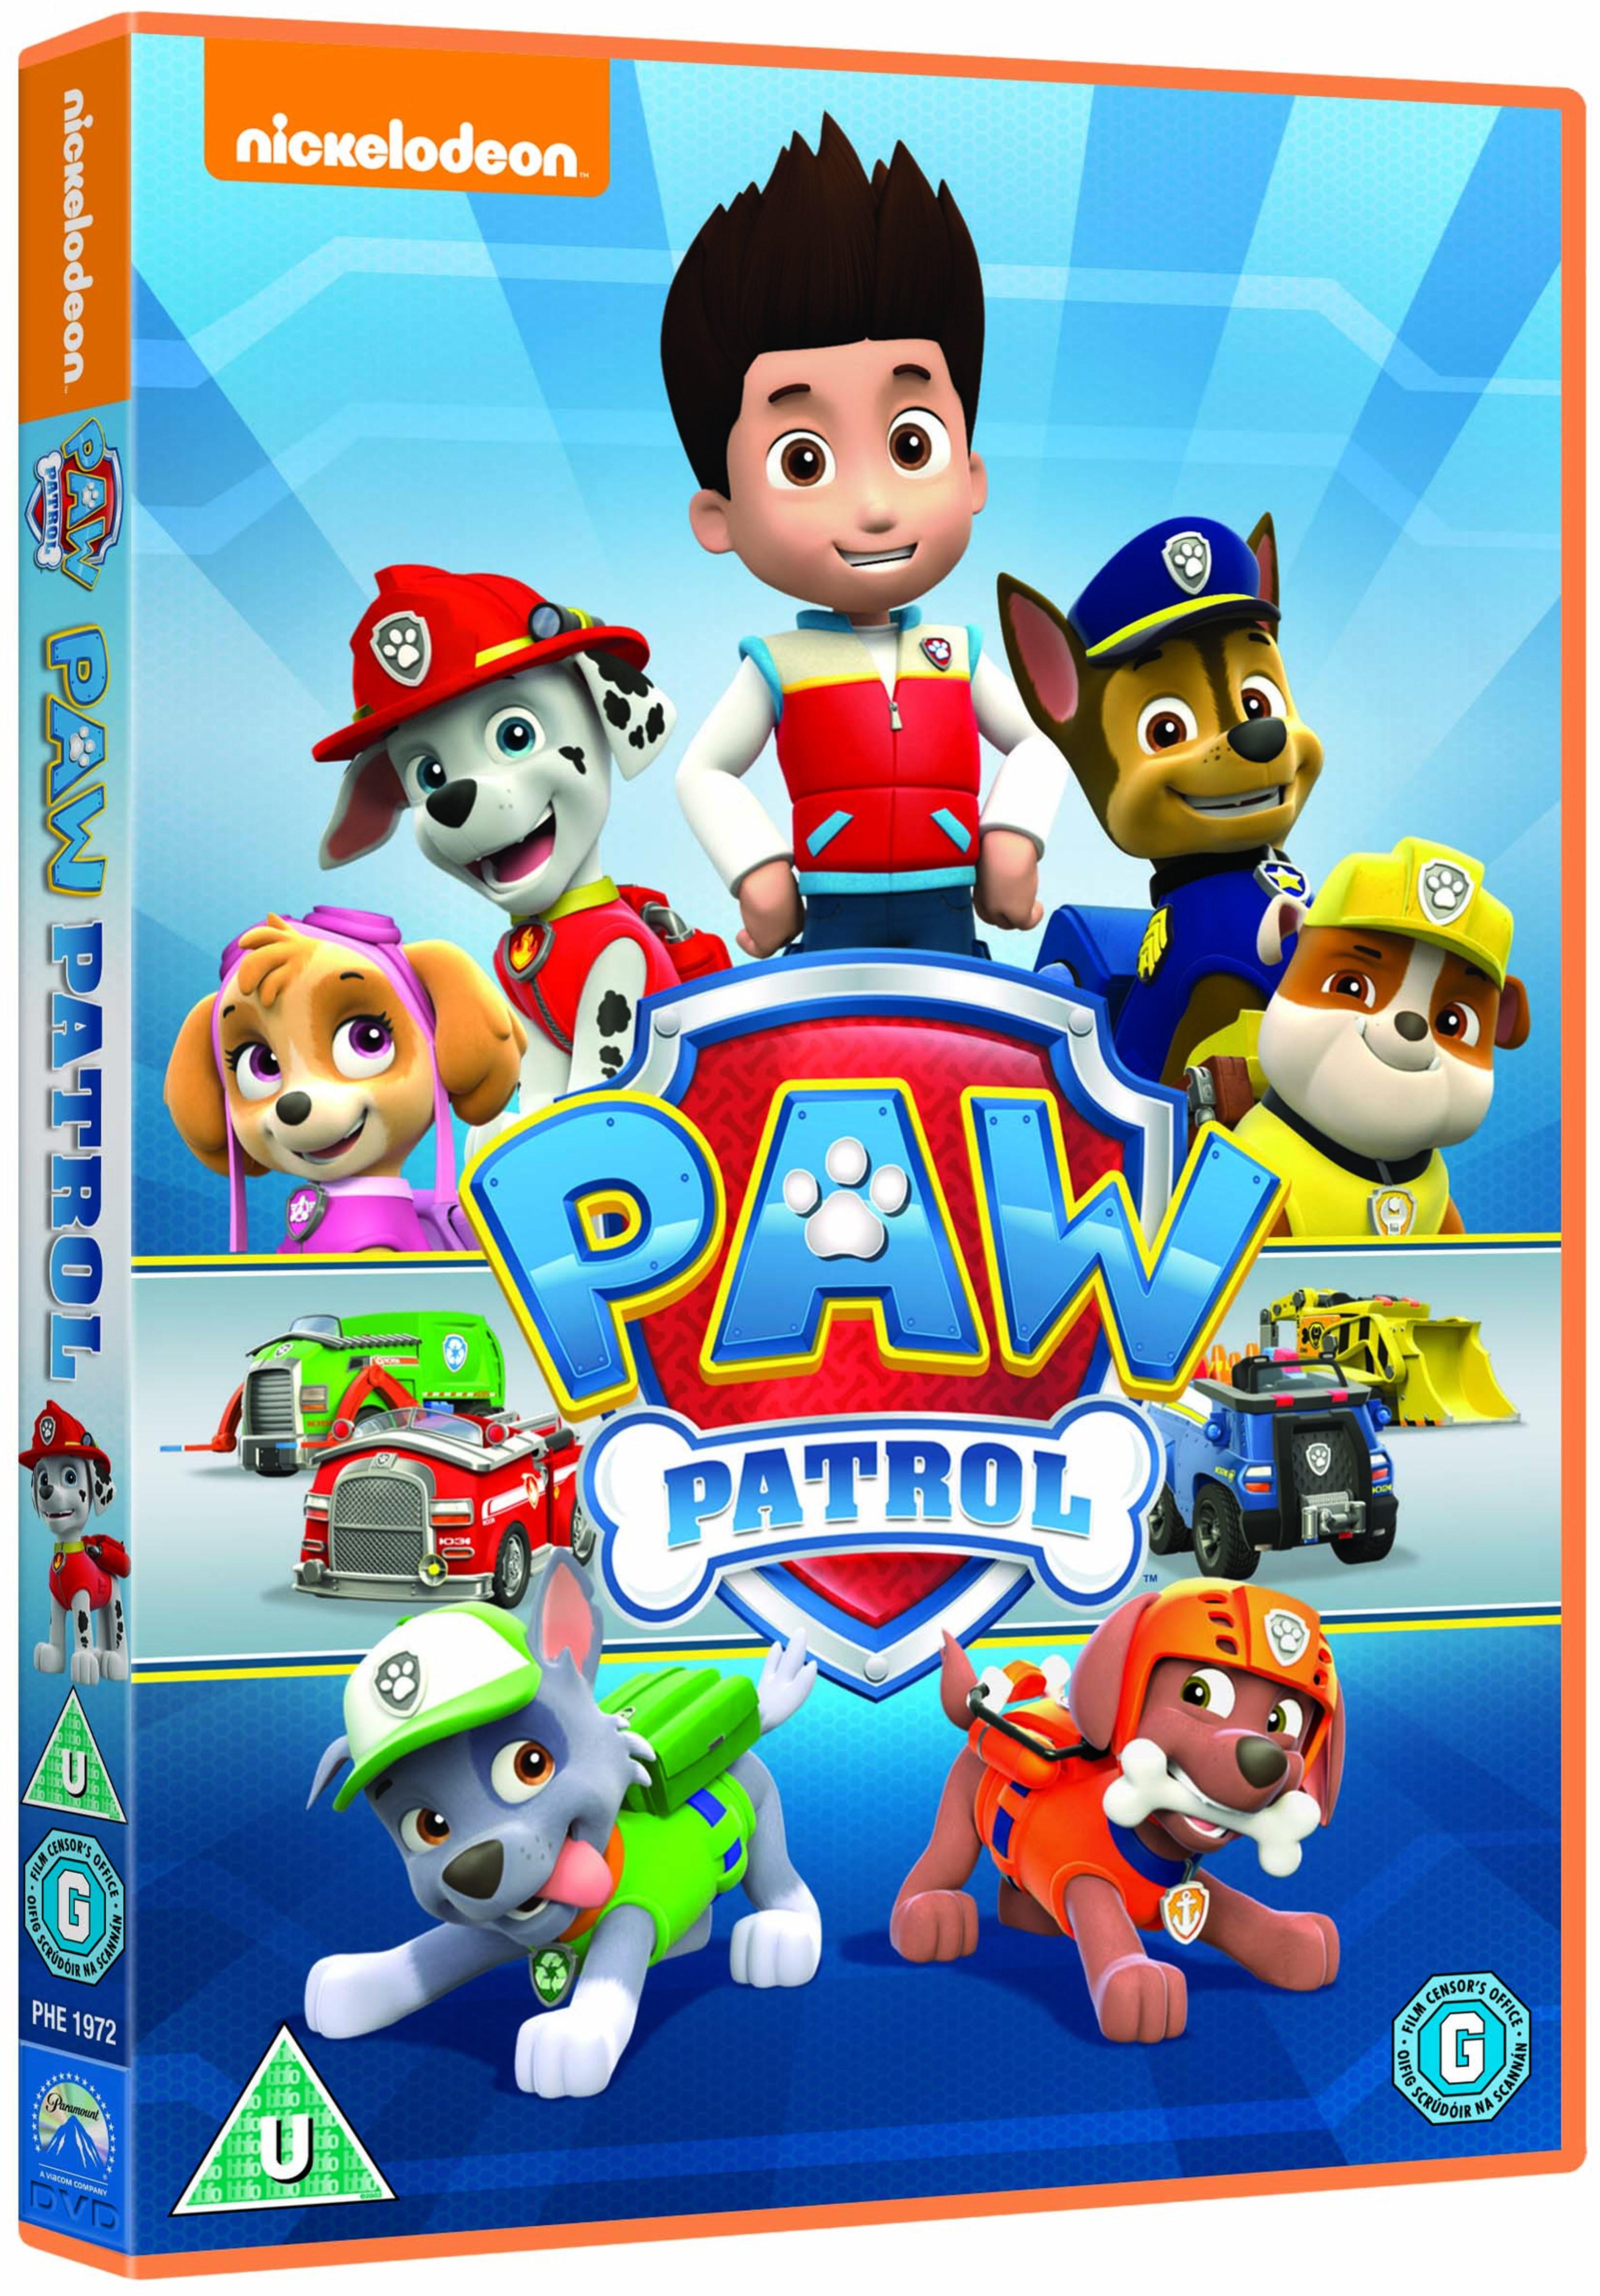 paw patrol  dvd  free shipping over £20  hmv store